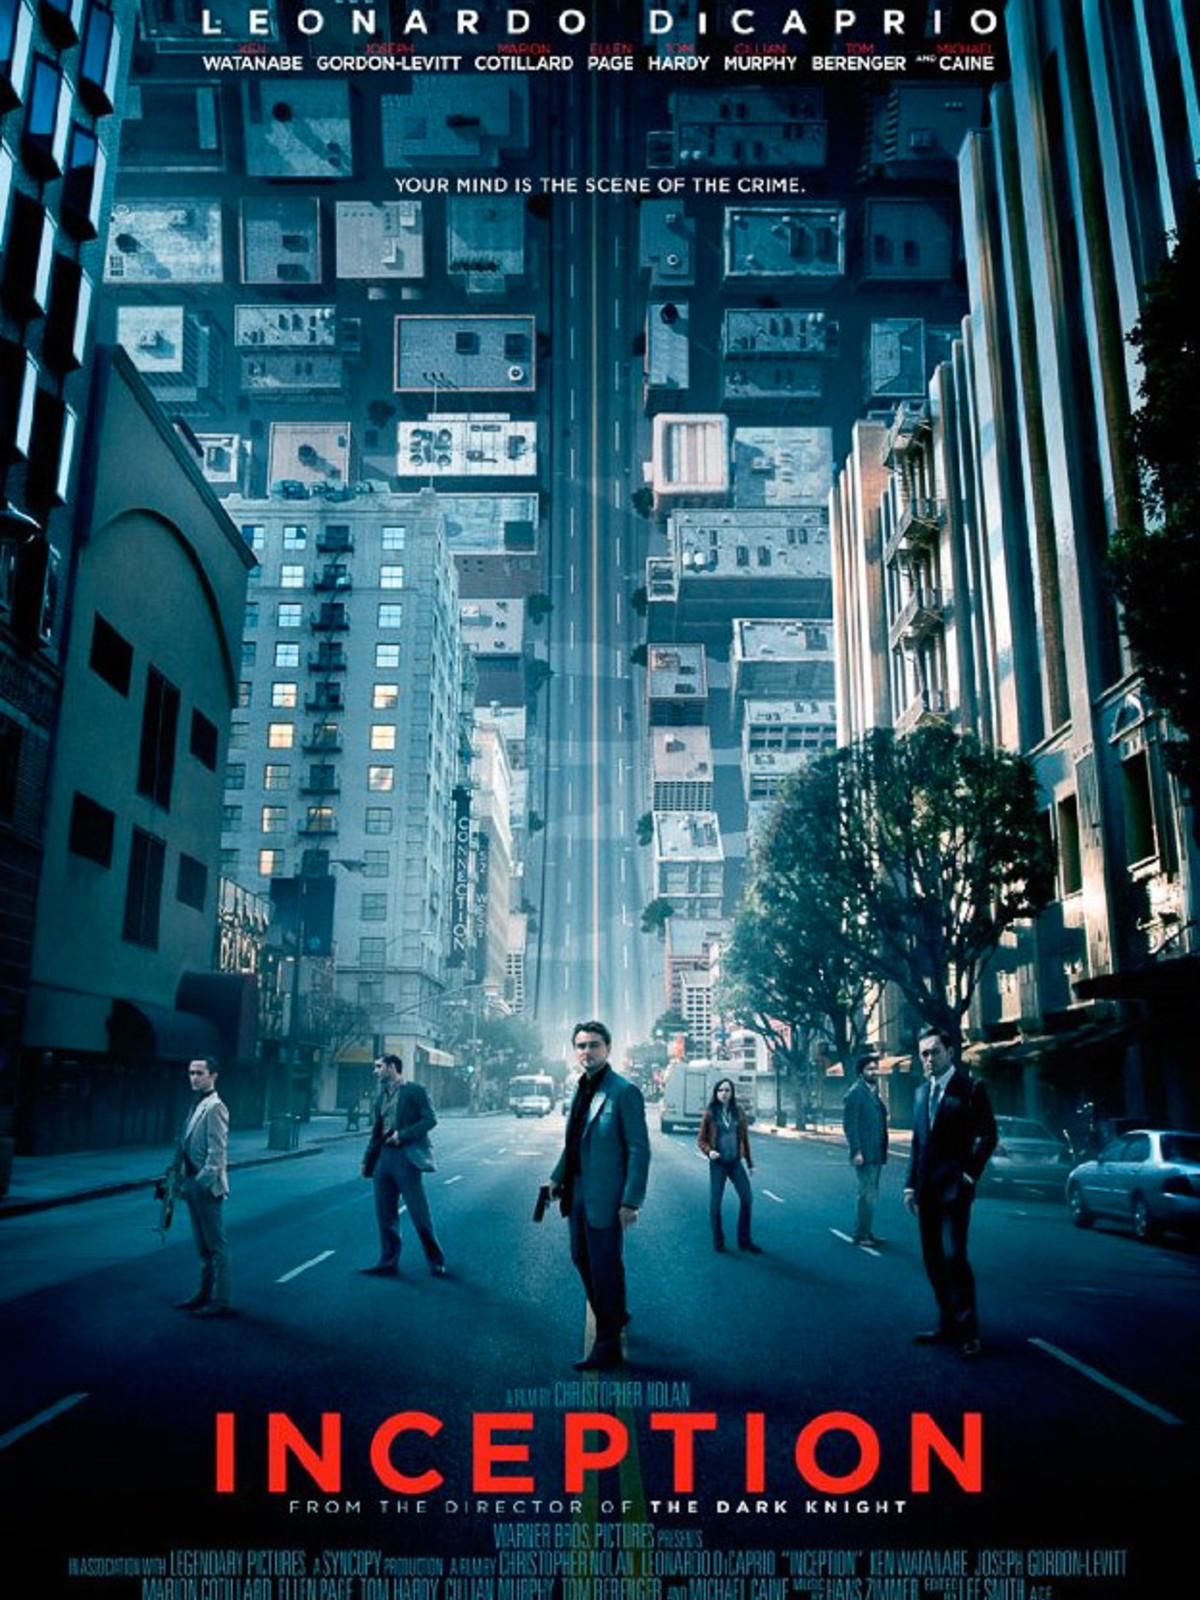 News_Inception_movie_movie poster